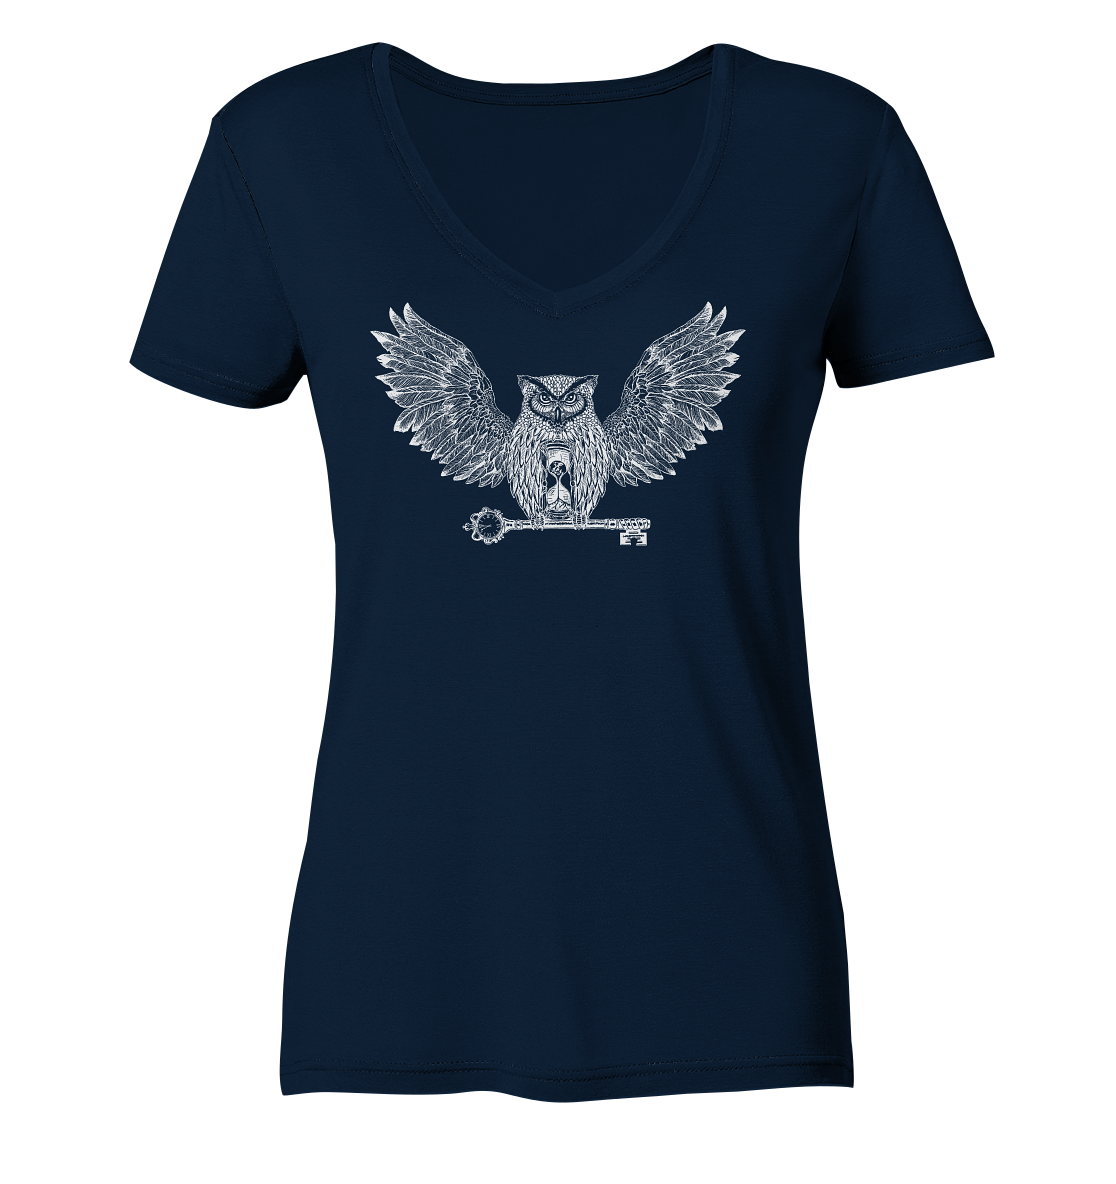 front-ladies-organic-v-neck-shirt-0e2035-1116x-2.png